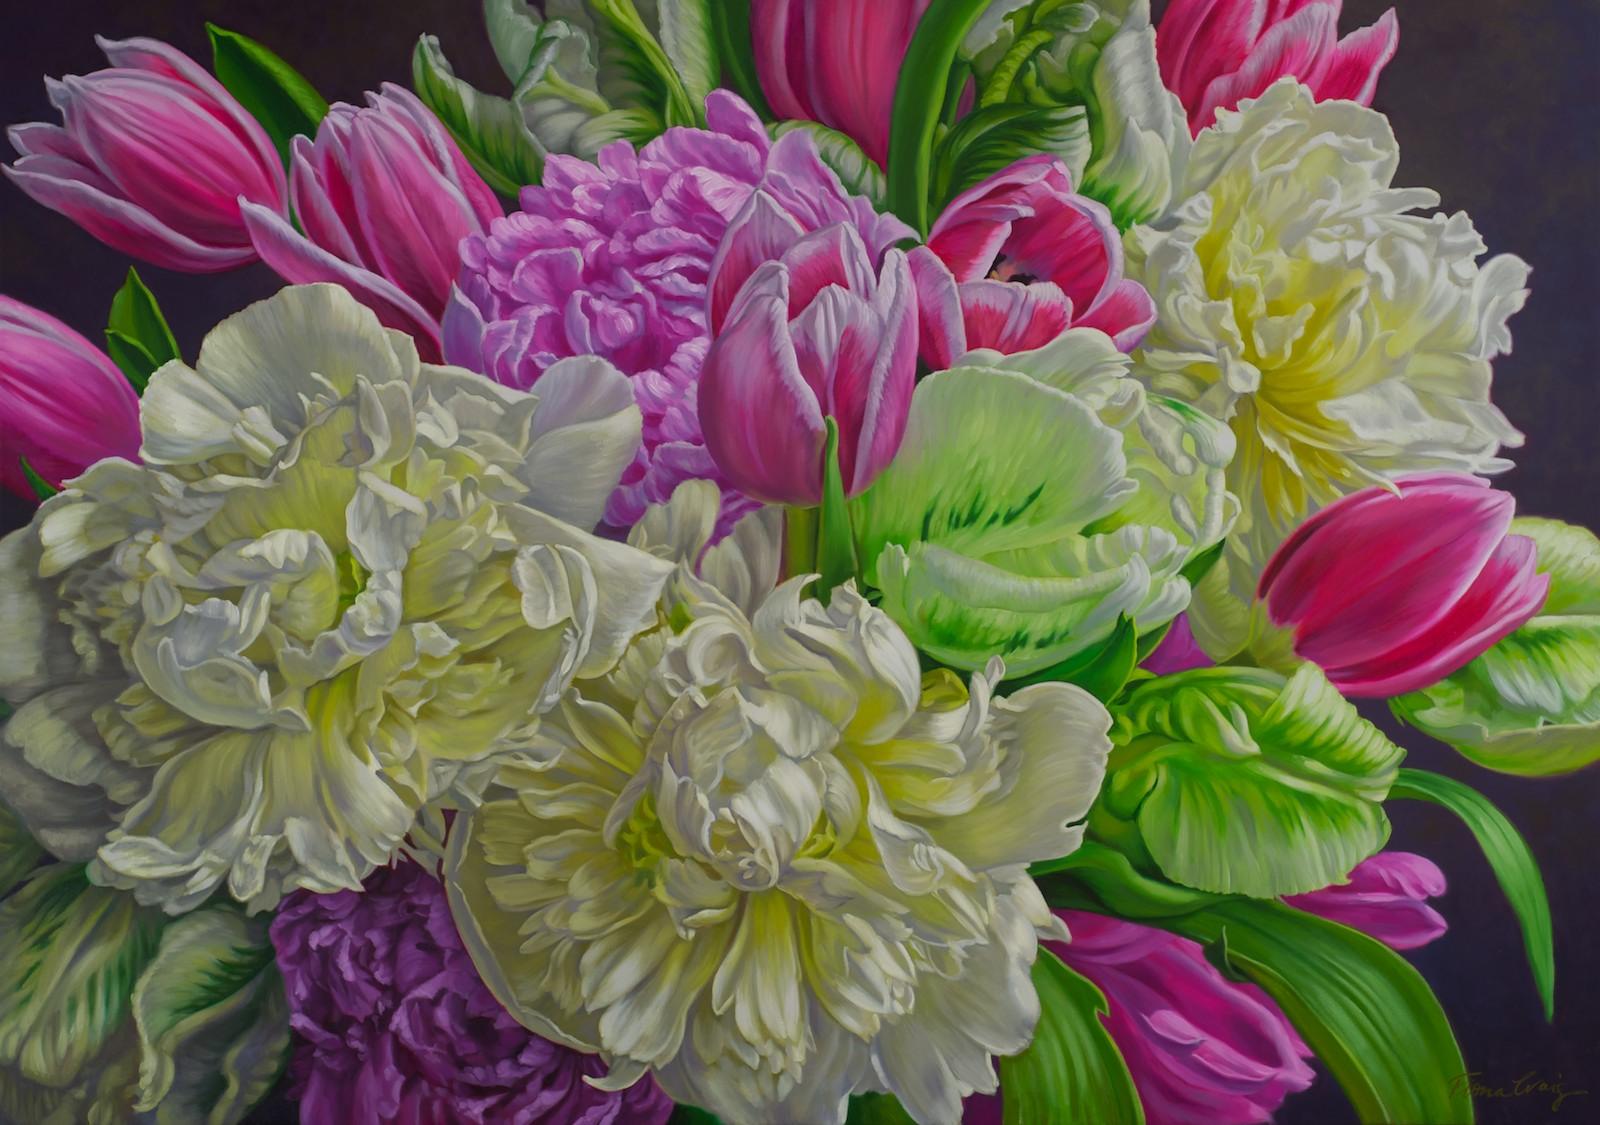 #13838 Fiona Craig 'White Peonies with Tulips' 97cm x 137cm